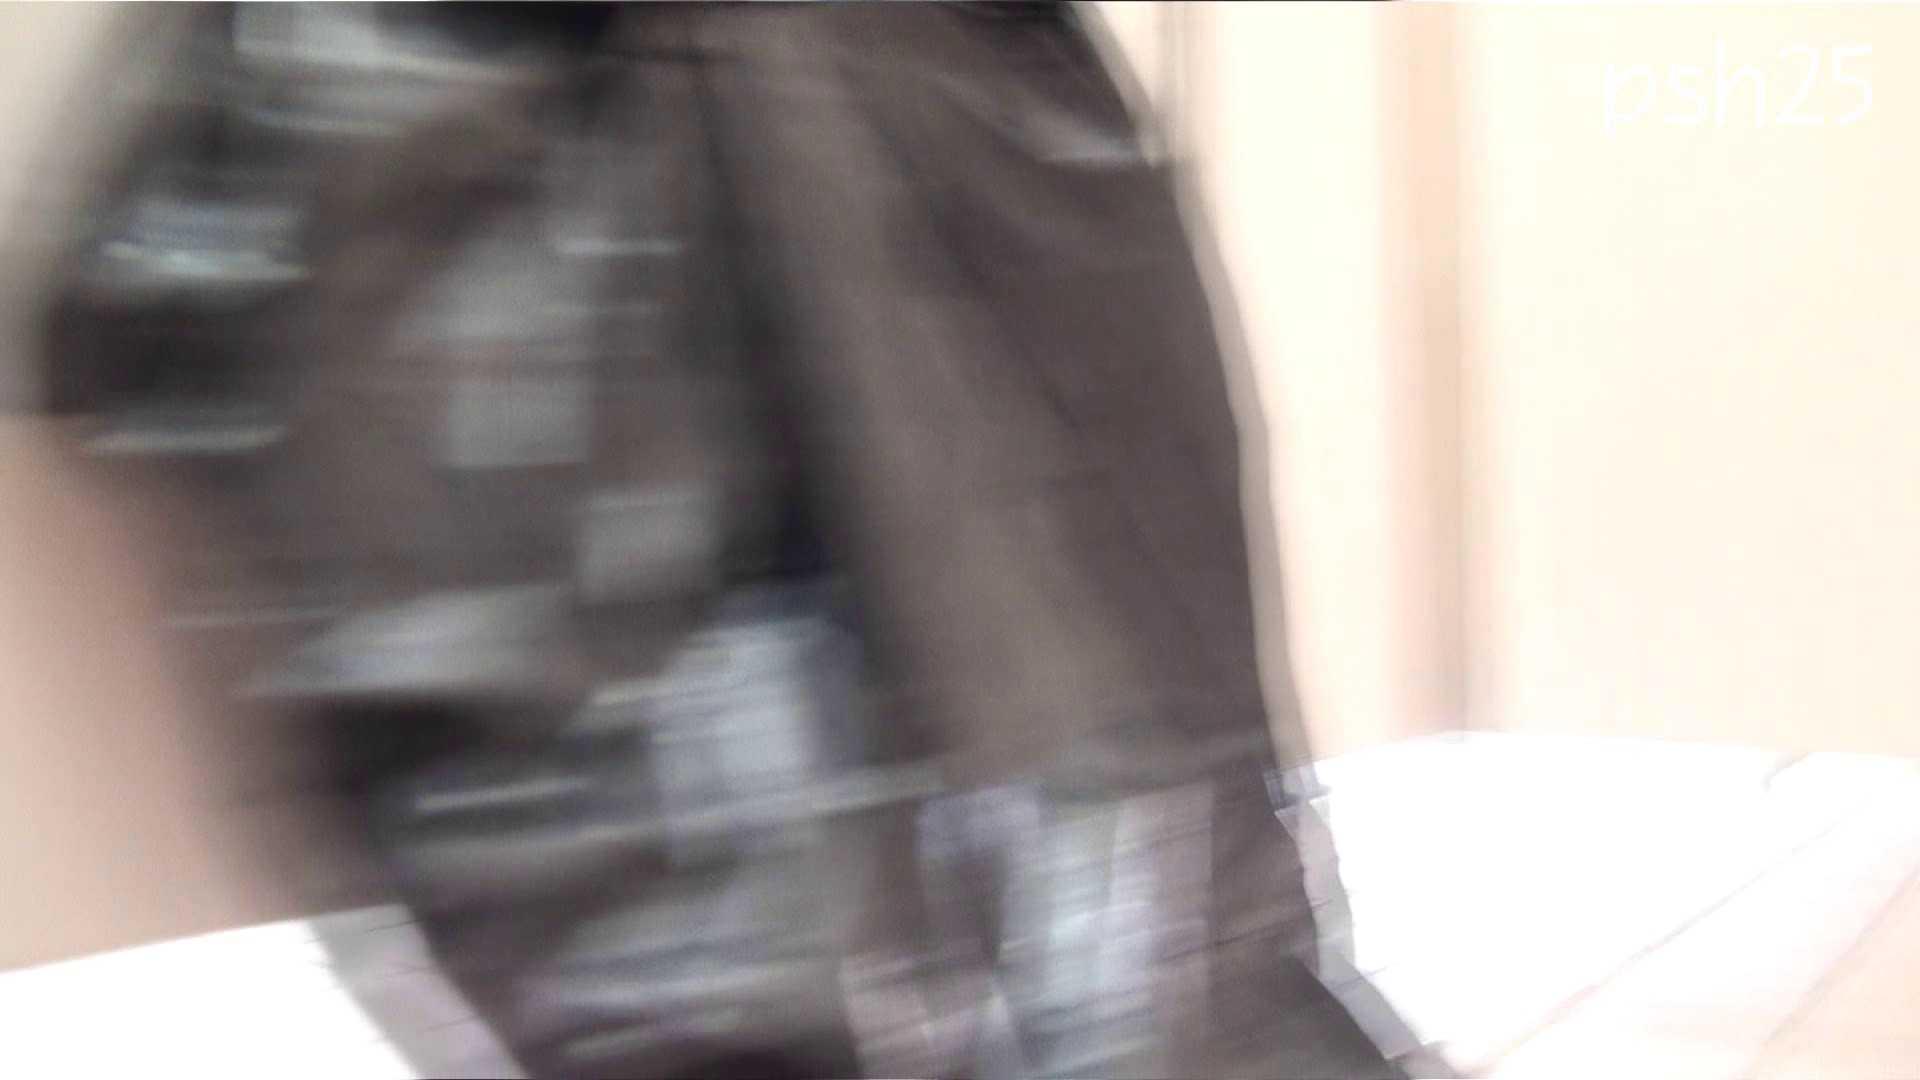 ▲復活限定▲ハイビジョン 盗神伝 Vol.25 盗撮映像大放出  106連発 96